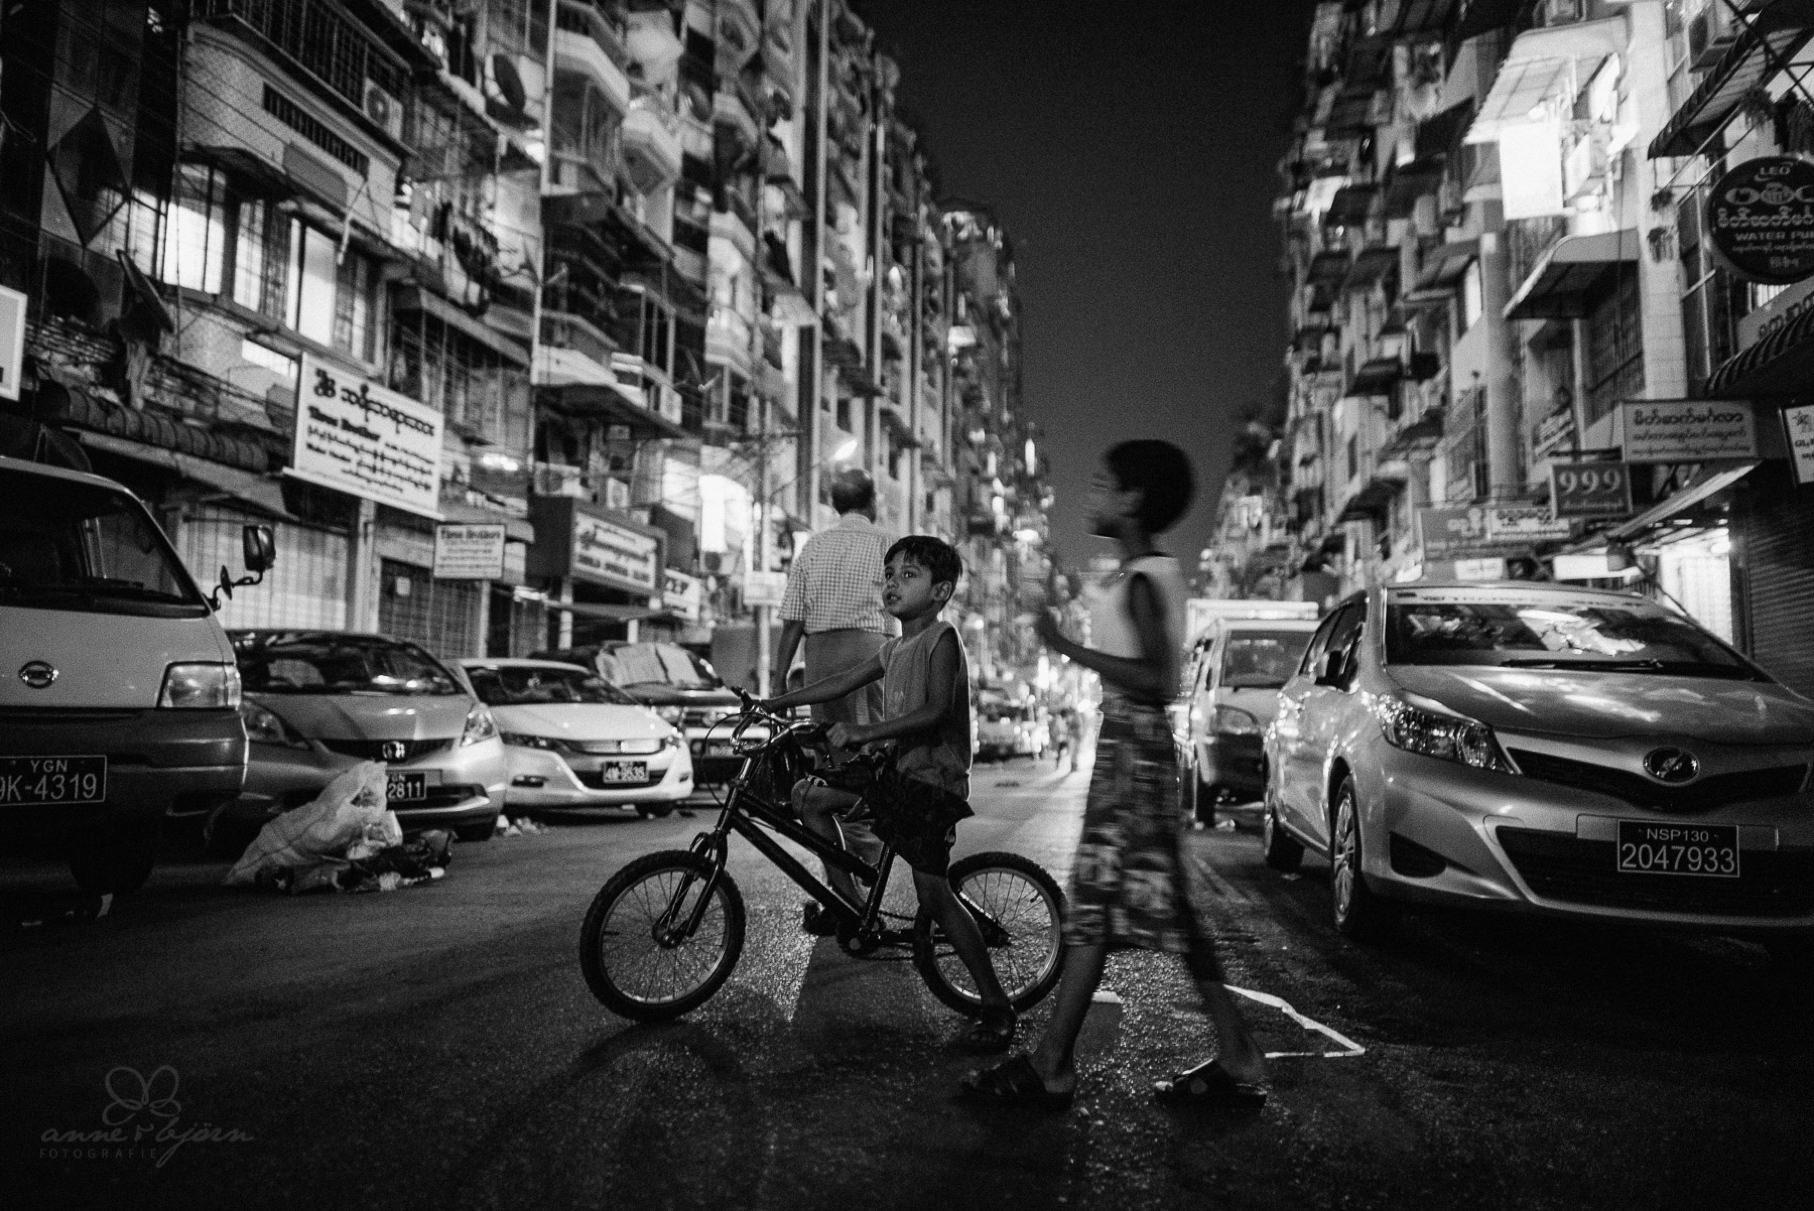 0031 yangon mandalay d76 4966 - Großstädte Myanmars - Yangon & Mandalay